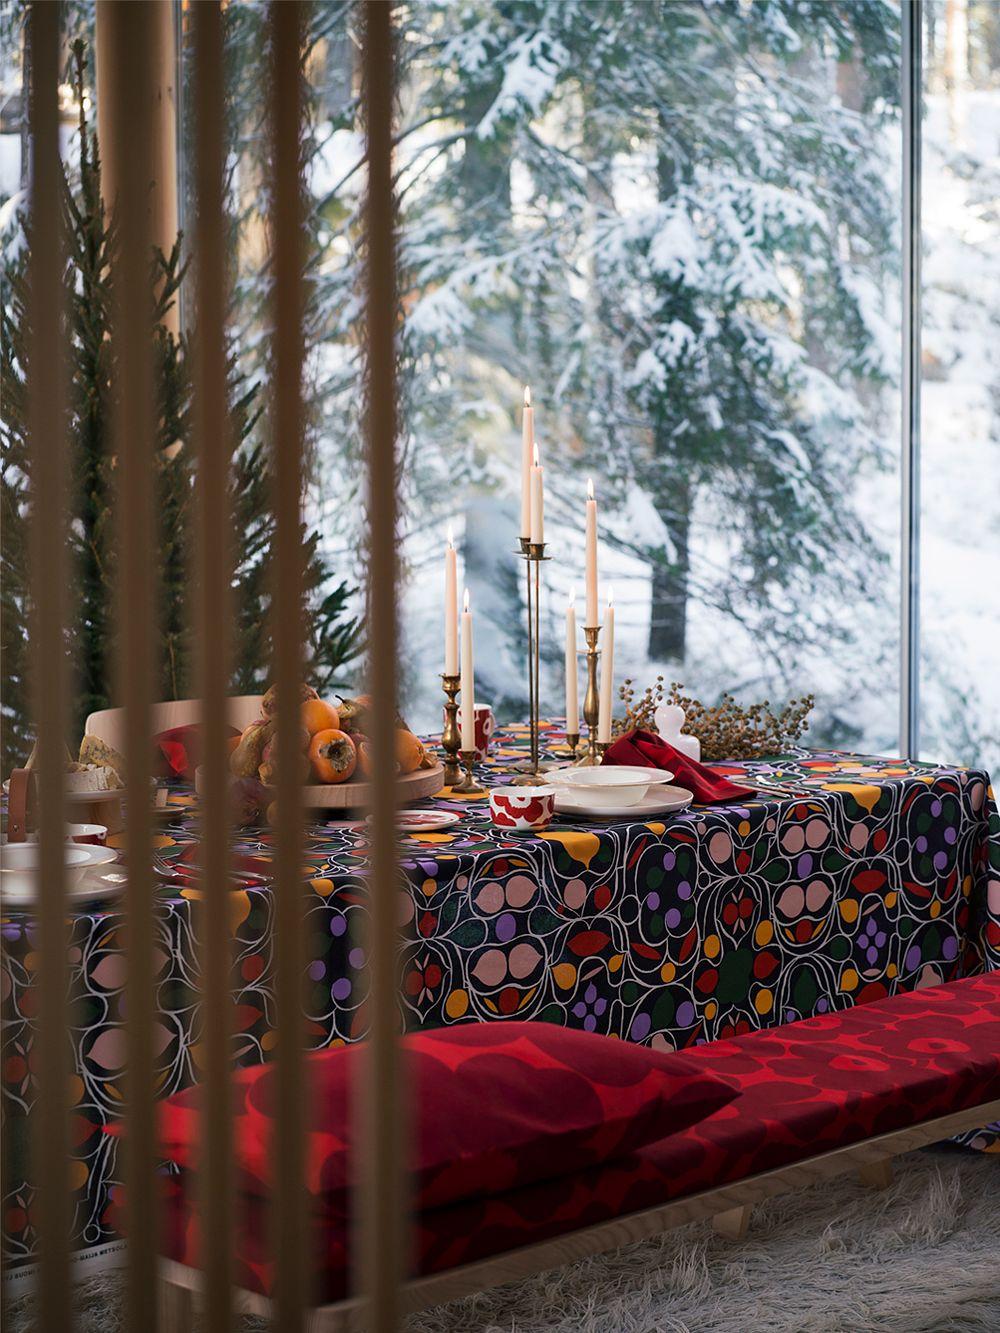 Marimekko Talvipalatsi fabric